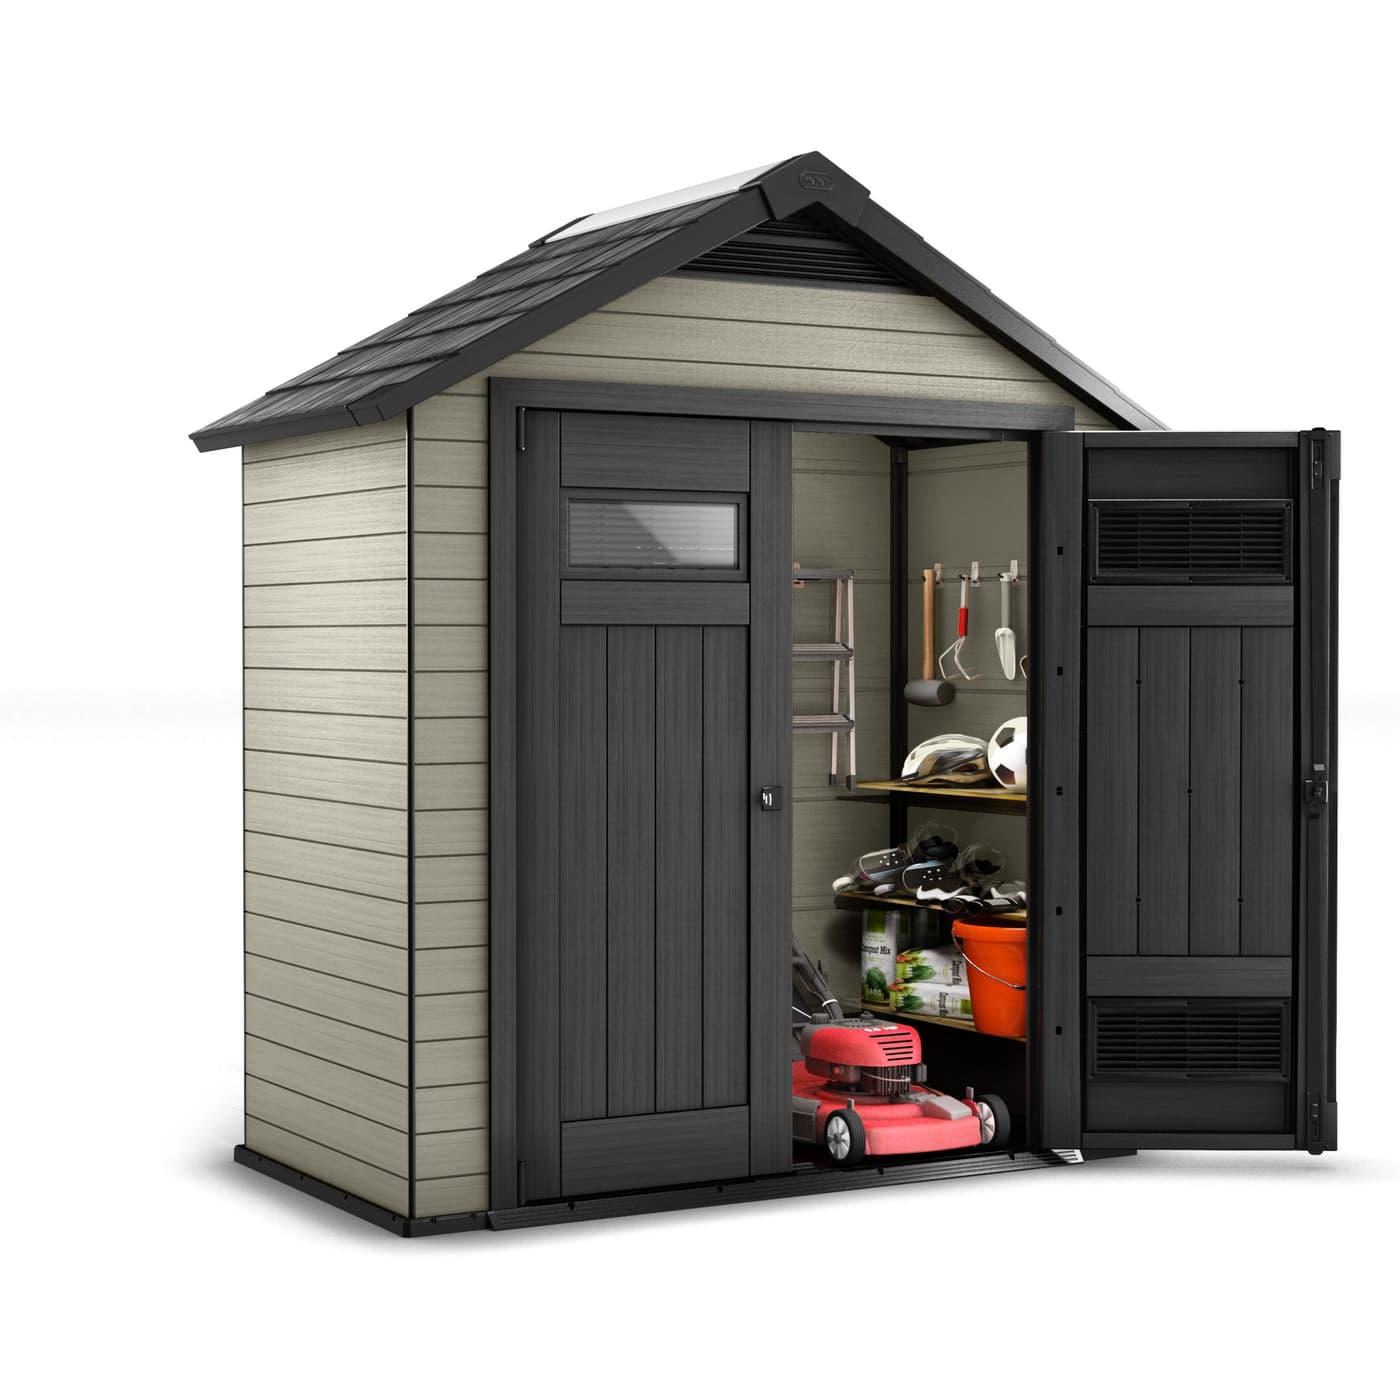 keter gartenhaus aus wpc 754 migros. Black Bedroom Furniture Sets. Home Design Ideas